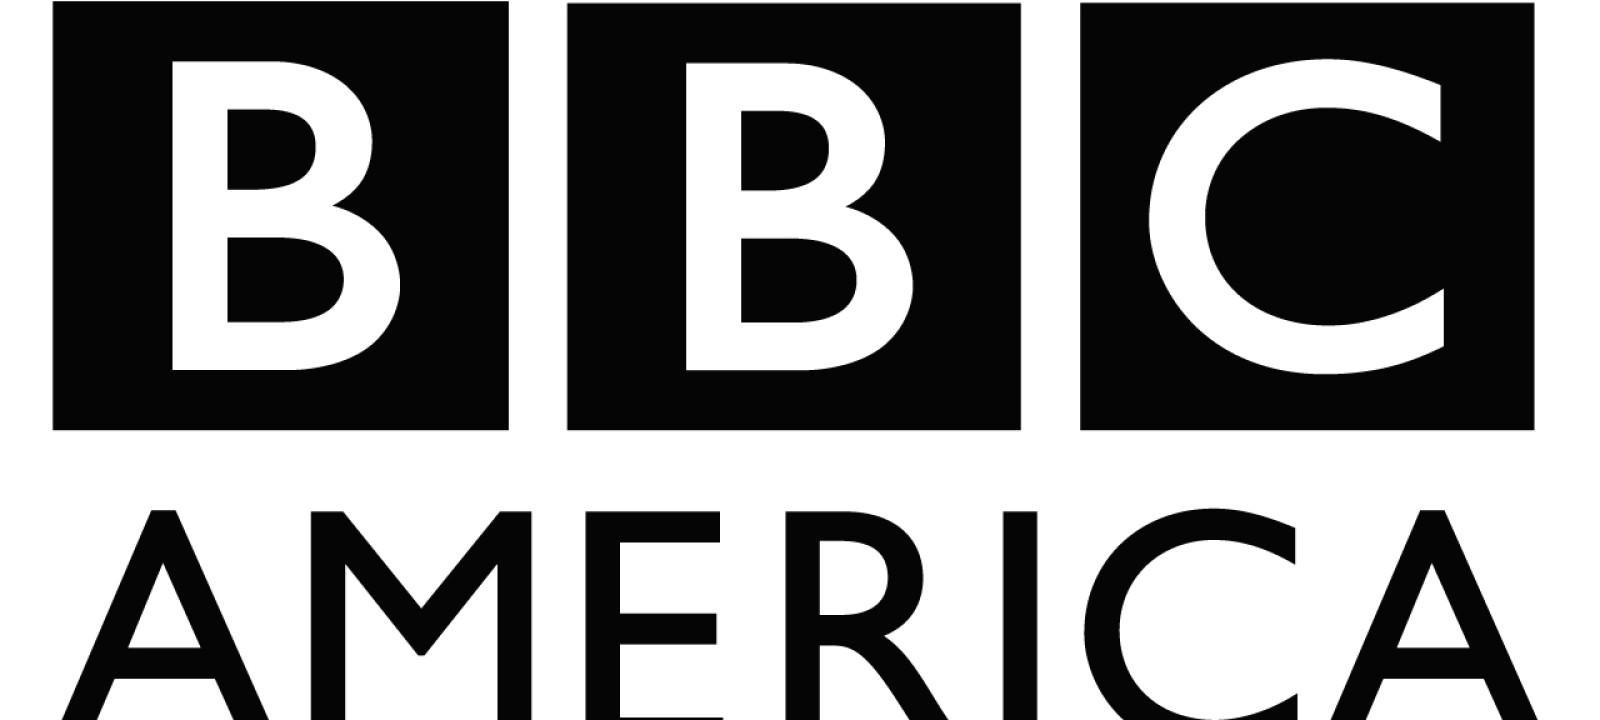 bbc_logo_1280x720